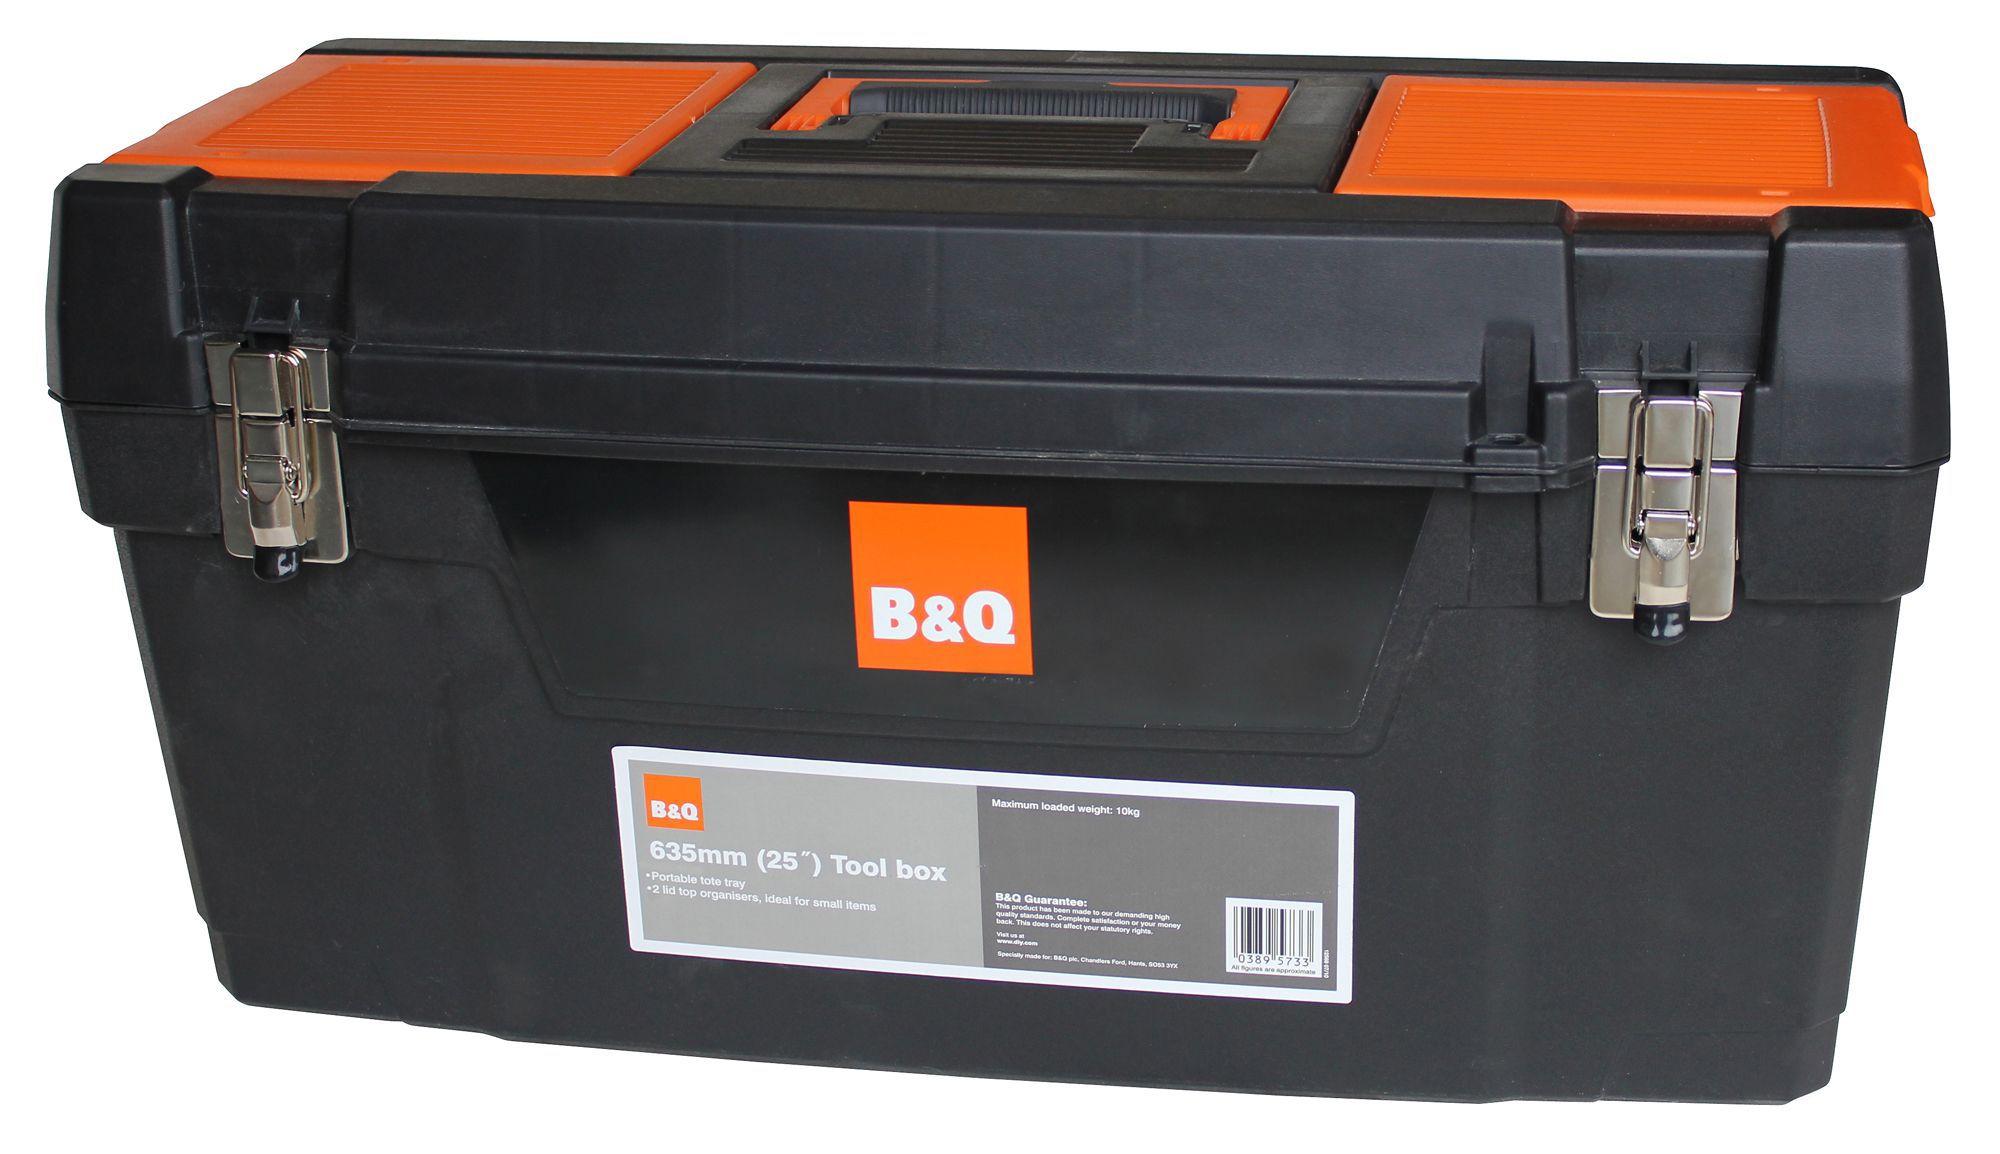 Home Furniture Diy Tool Boxes Storage 320mm Organizer